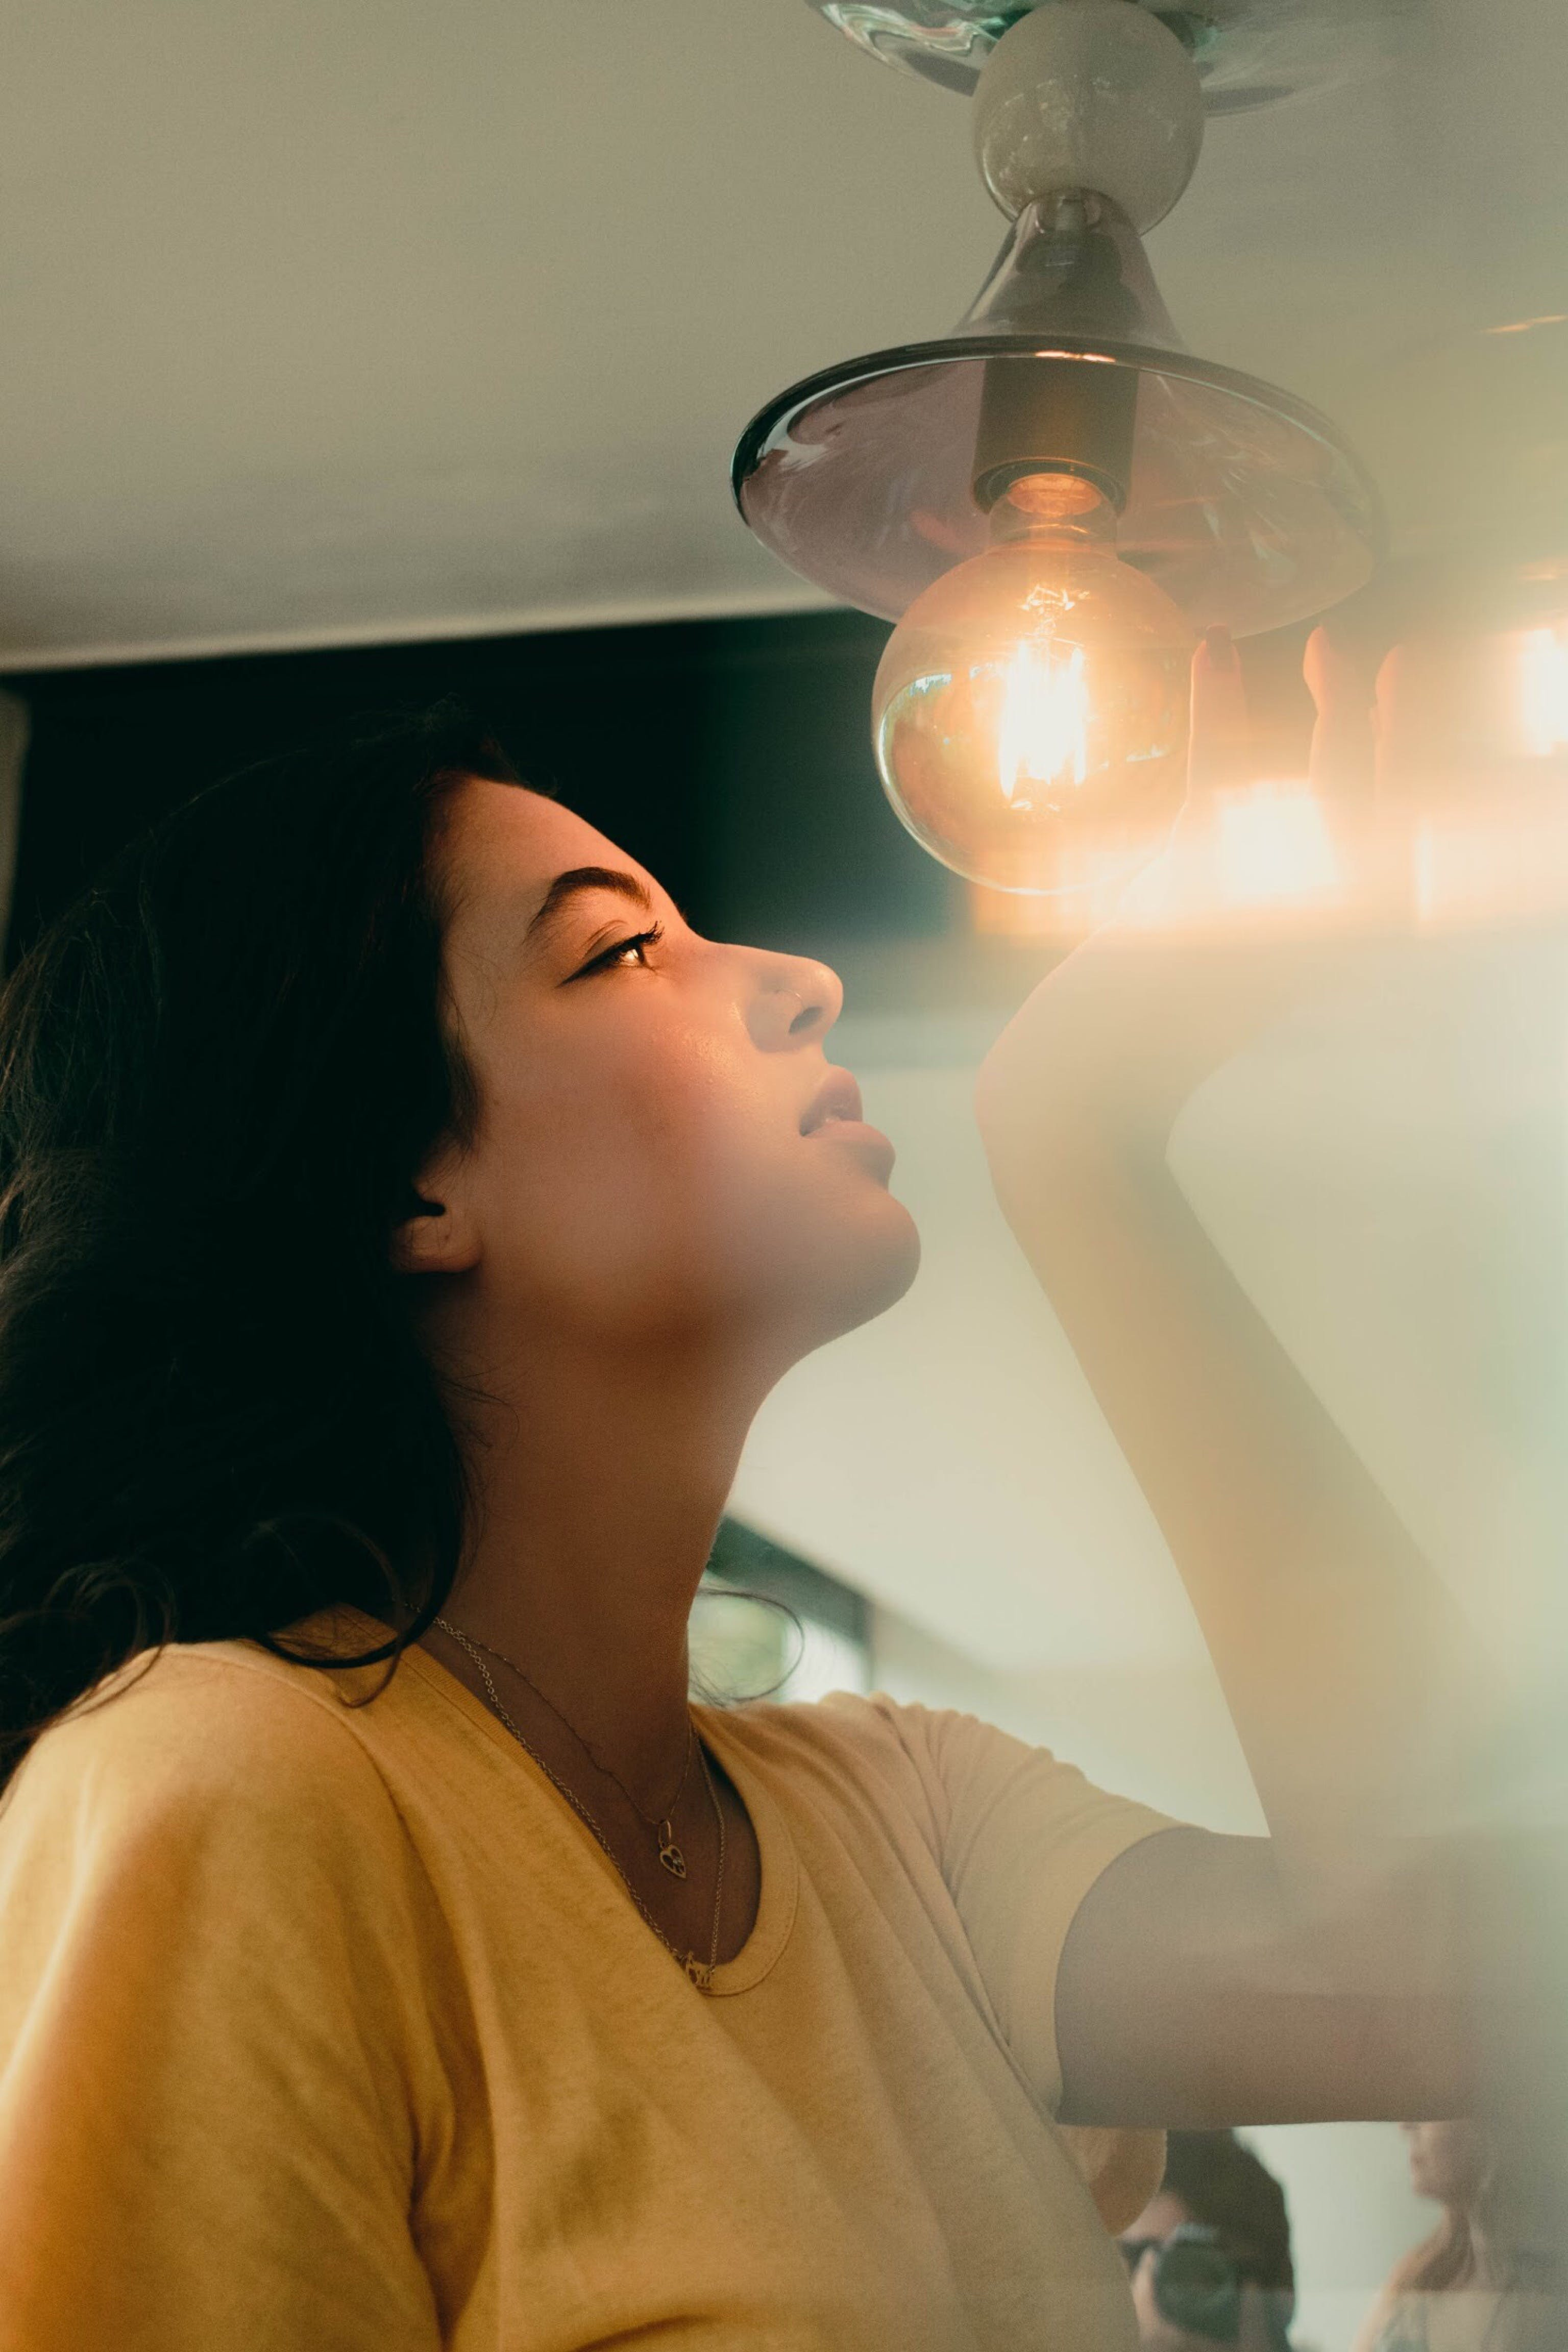 Woman Holding Light Bulb